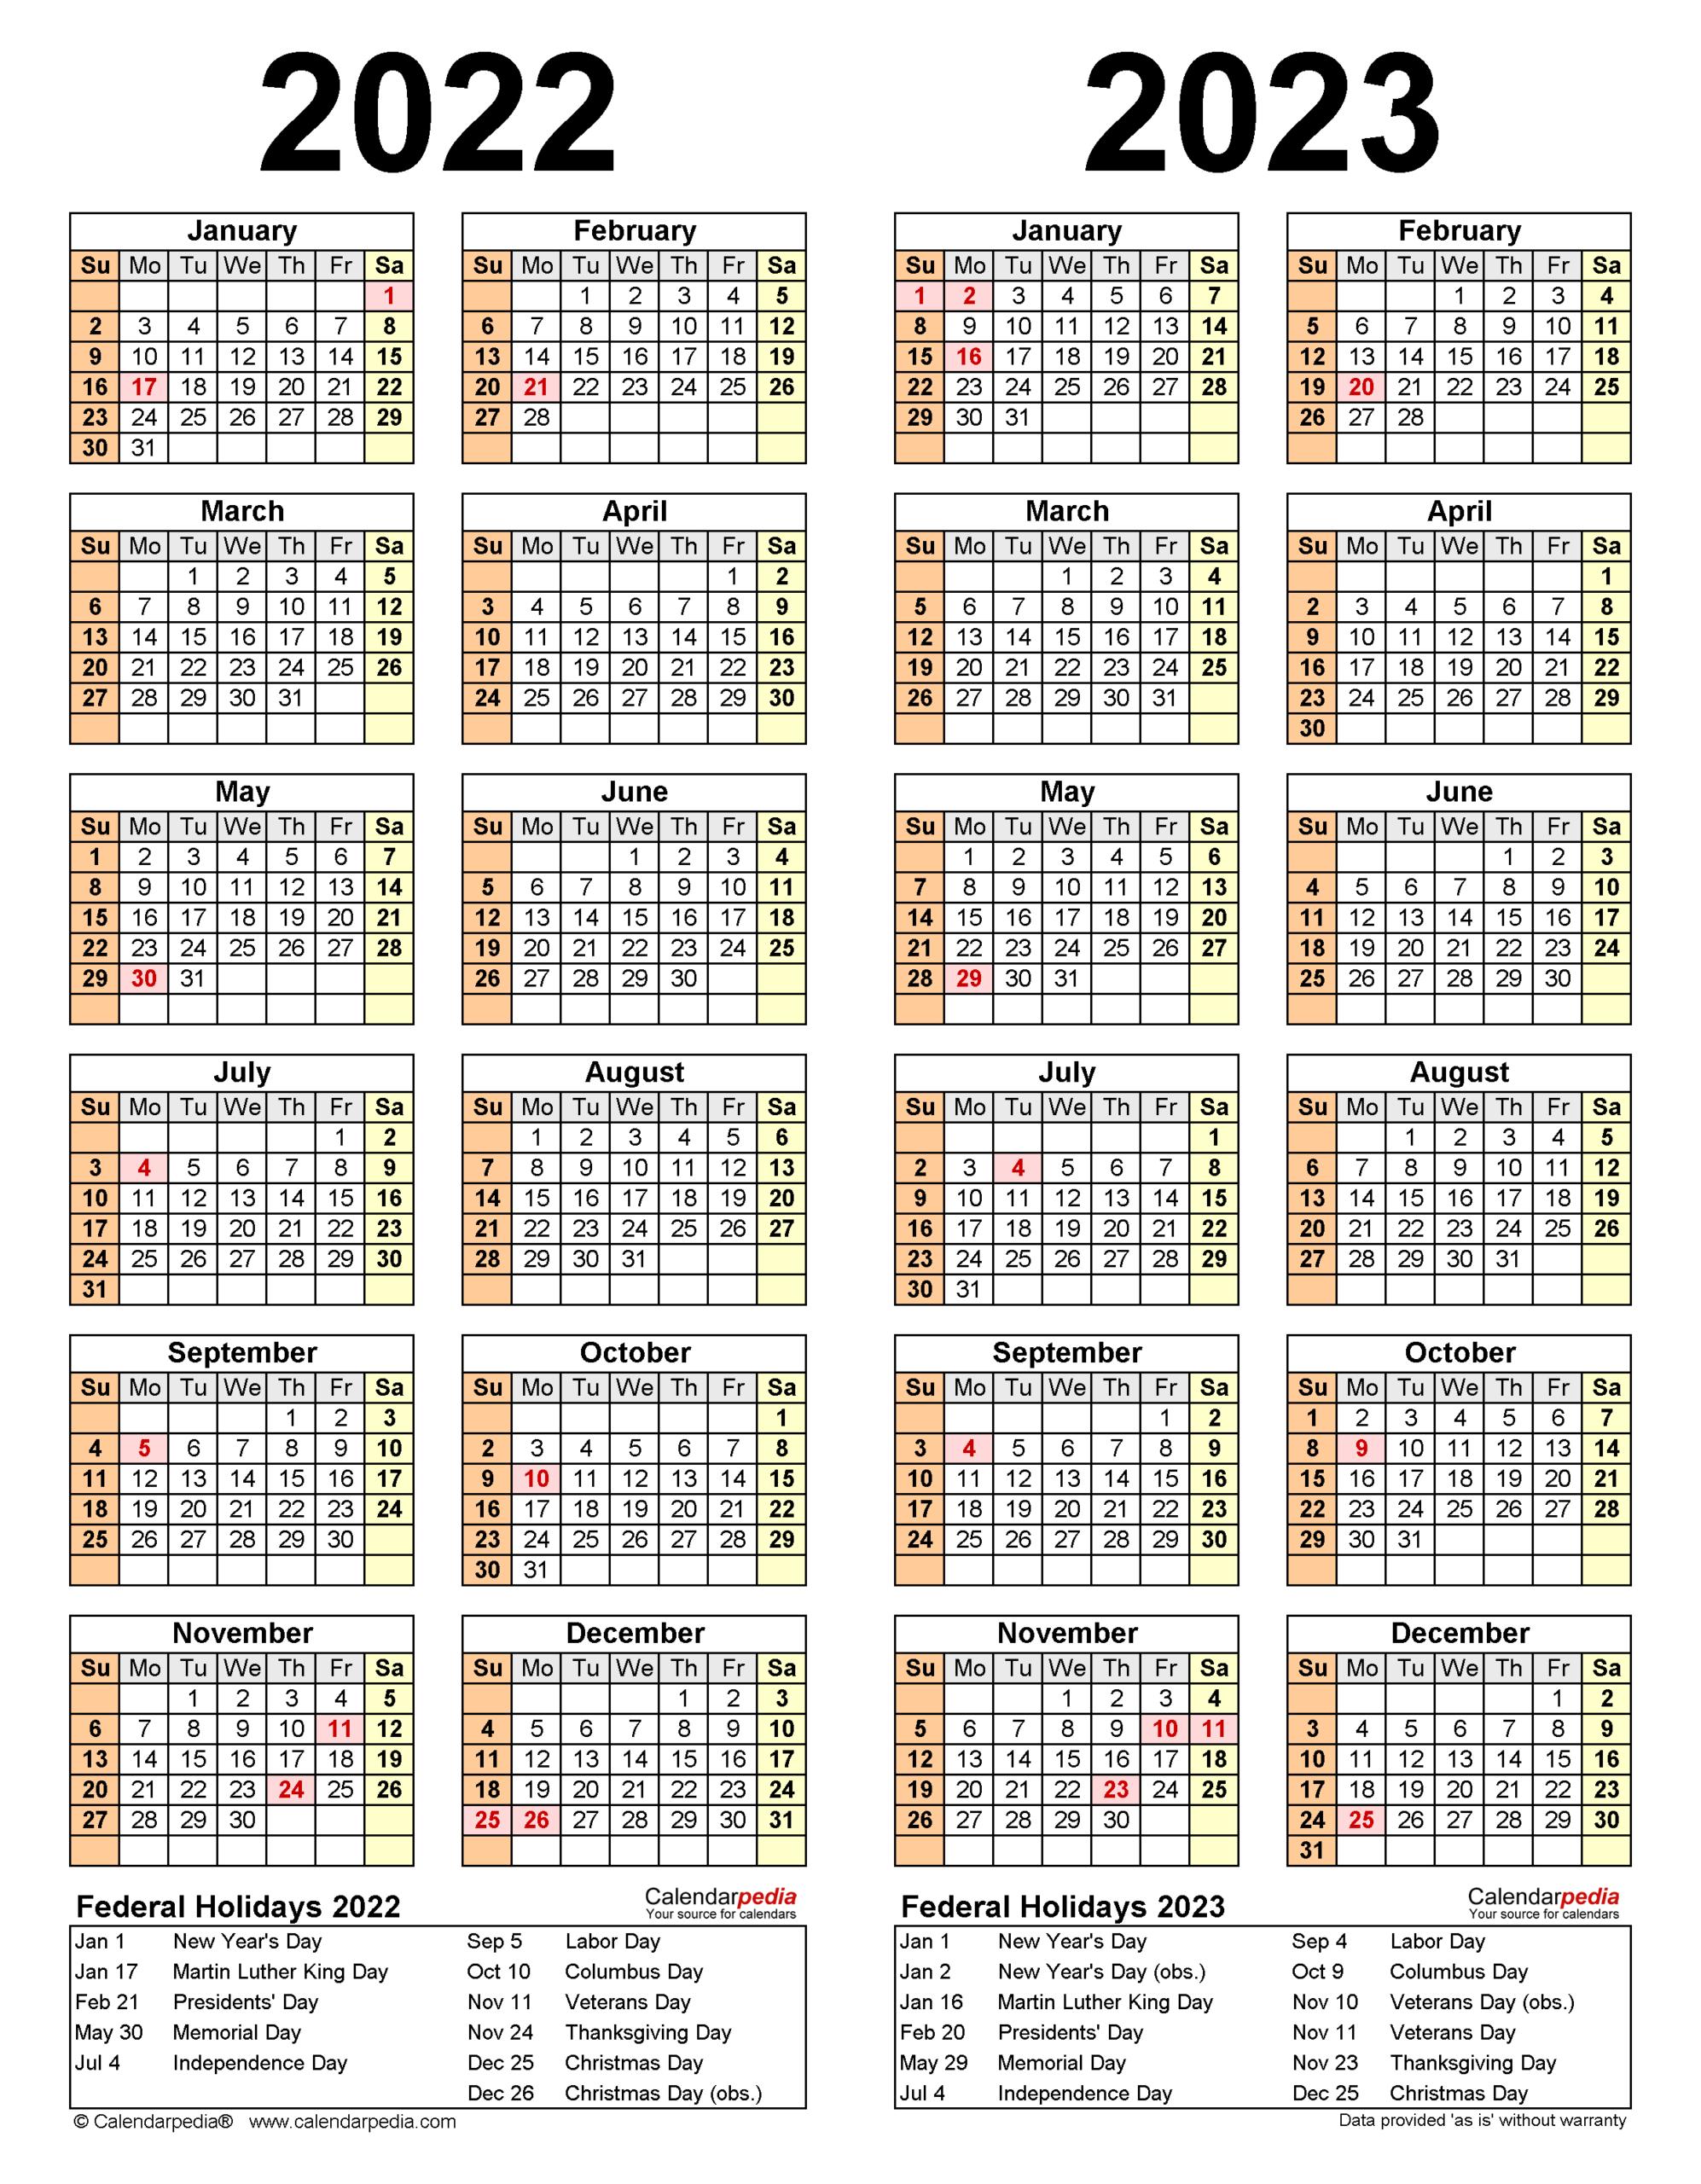 2022-2023 Two Year Calendar - Free Printable Word Templates in Walmart 2022 2023 Fiscal Calendar